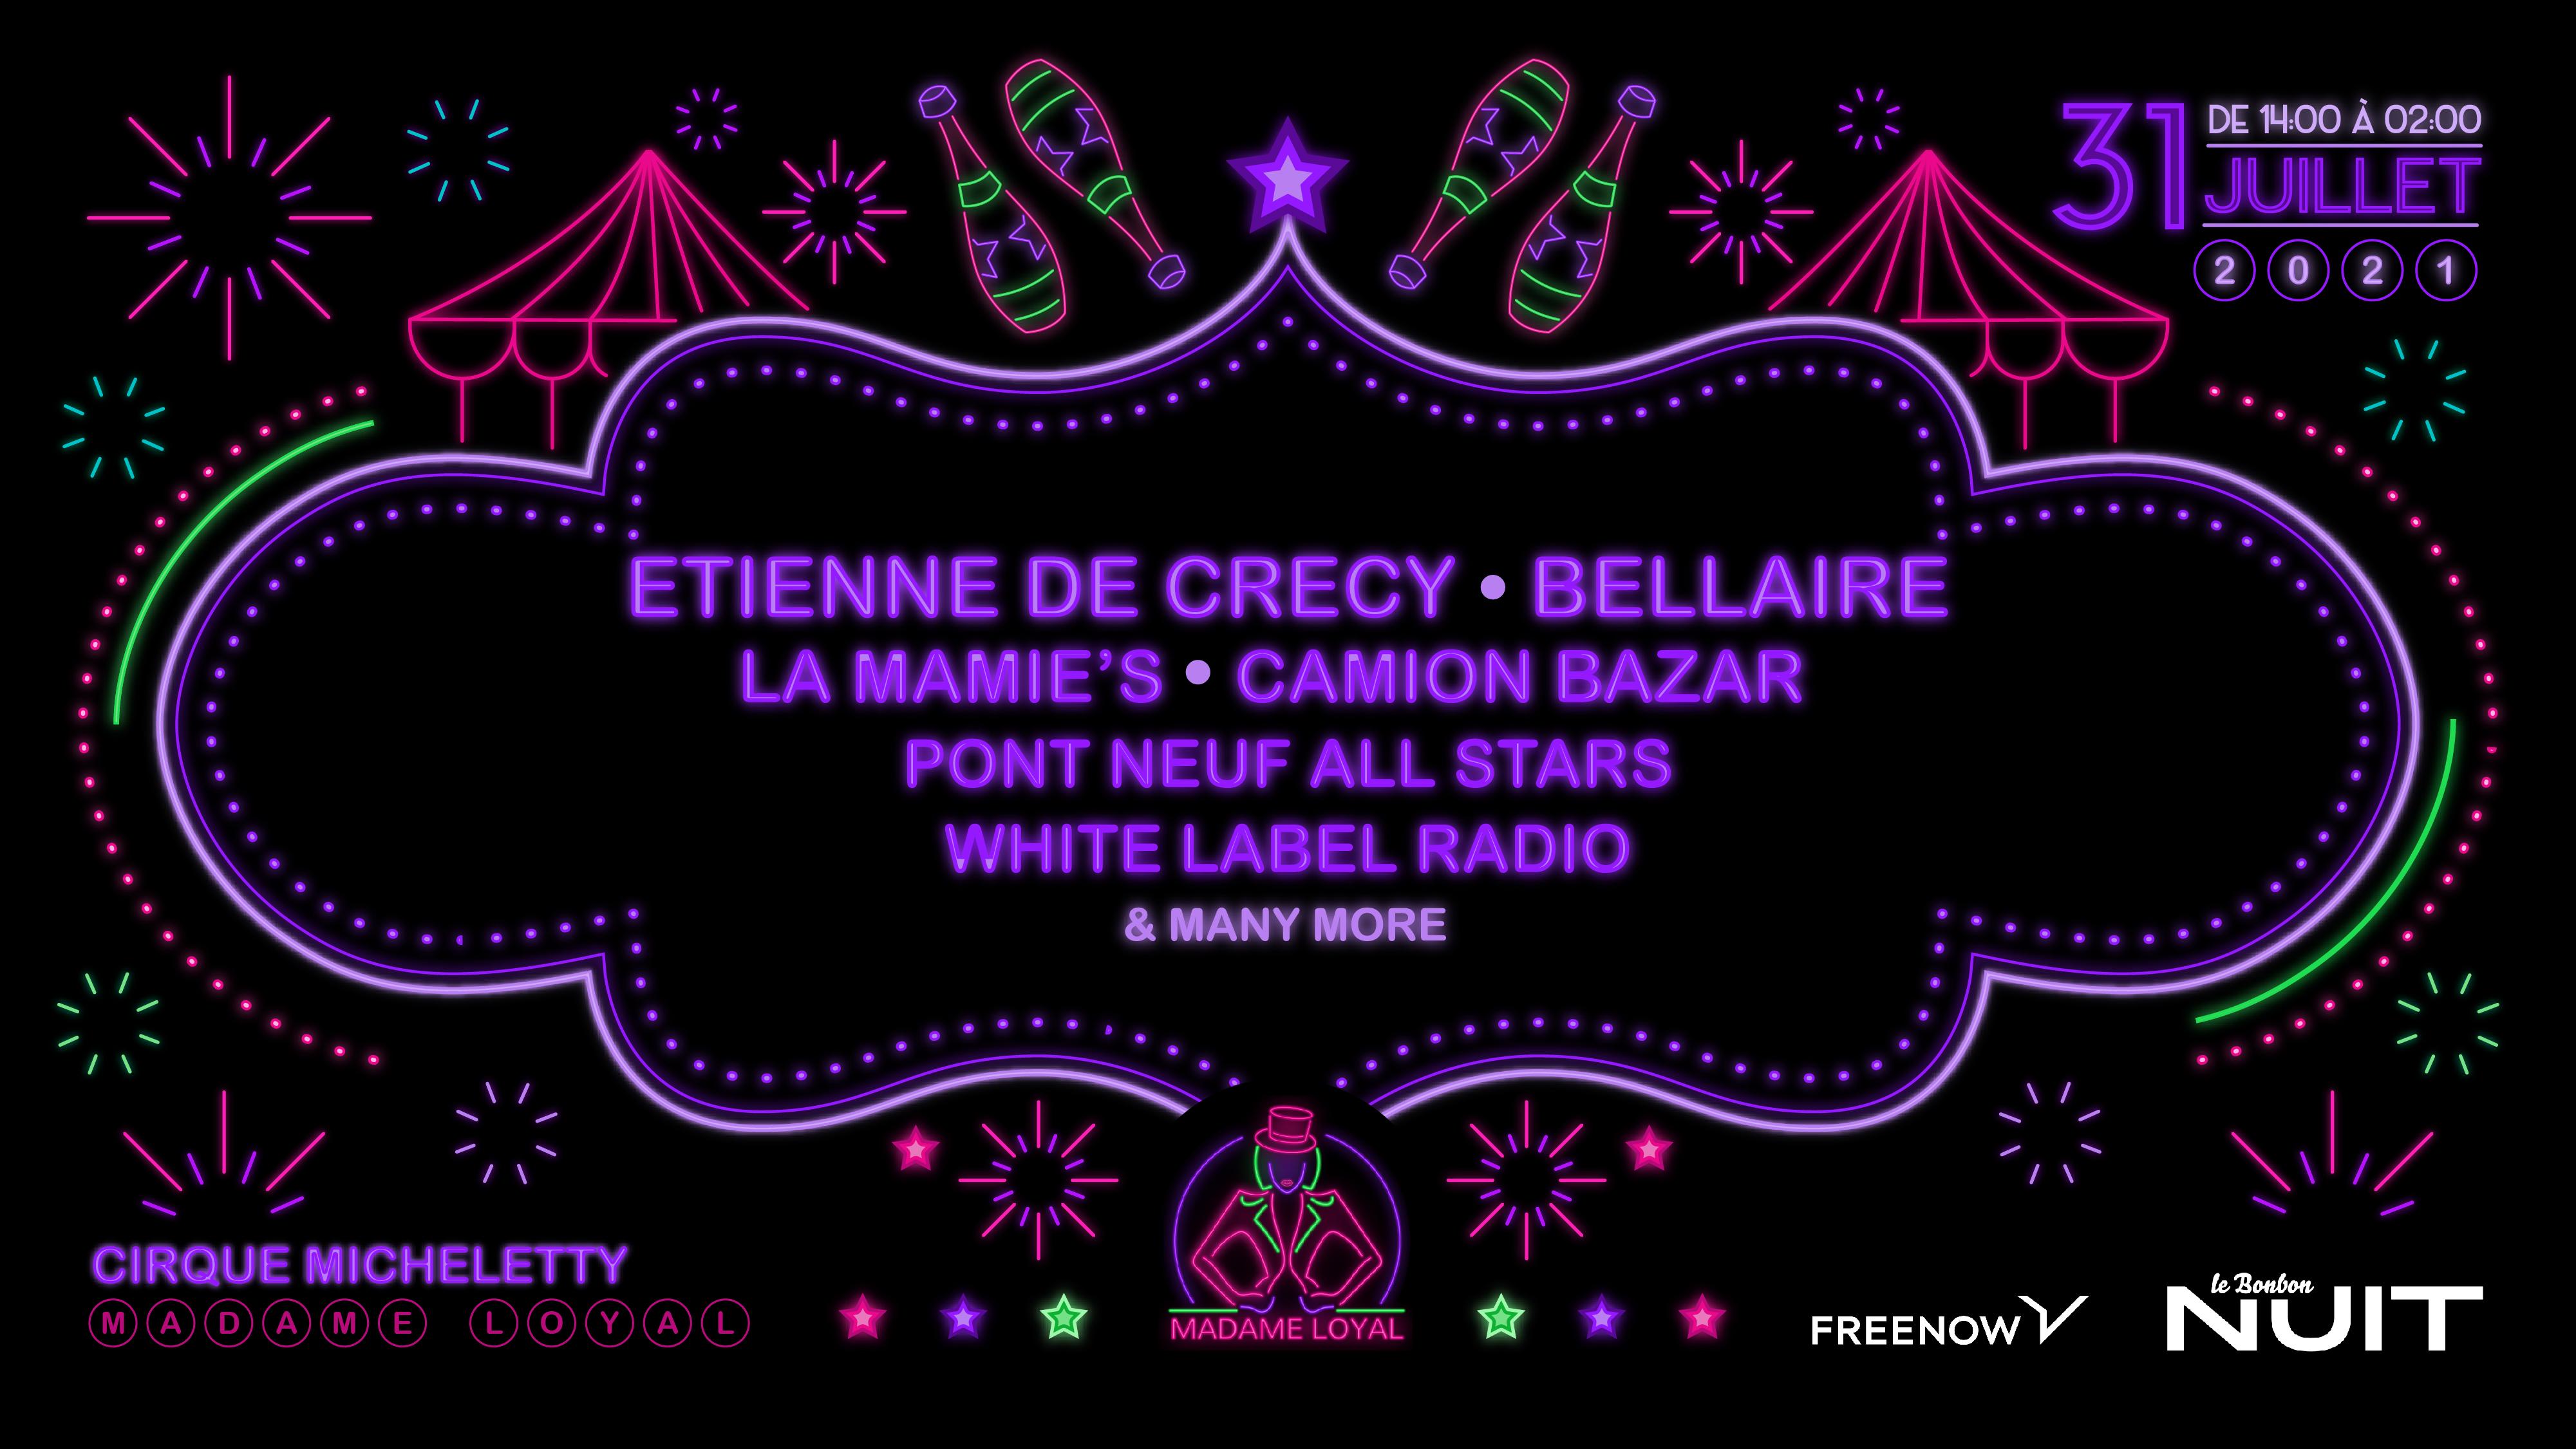 Madame Loyal : Etienne de Crecy, La Mamie's, Bellaire . .